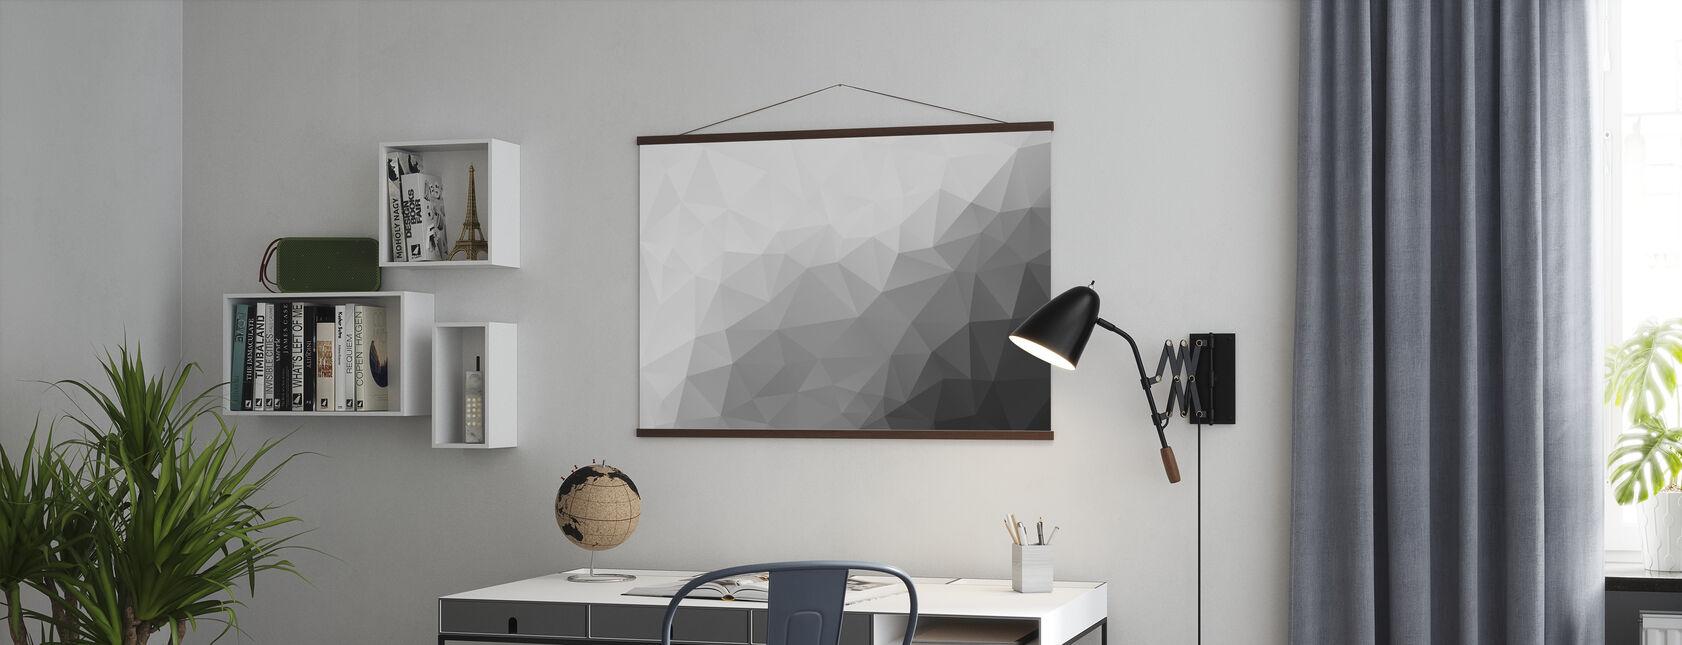 Polygonal Grautöne 2 - Poster - Büro